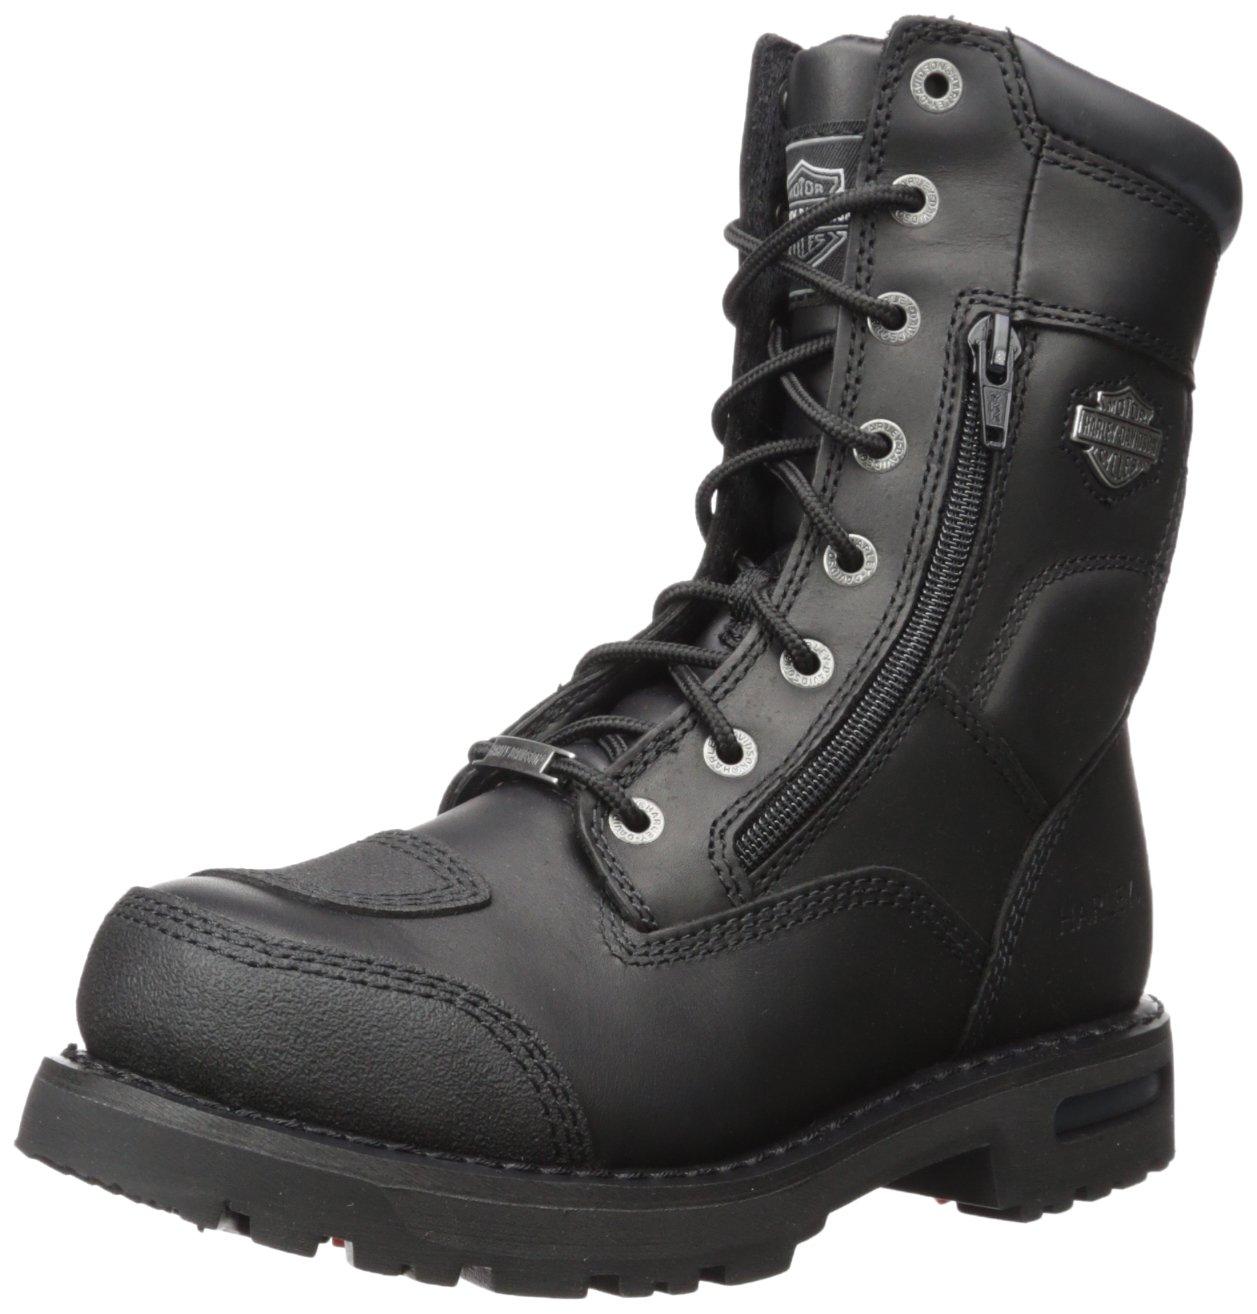 174947d559dfa7 Harley-Davidson Men s Riddick 8-Inch Lace-UP Black Motorcycle Boots D98308